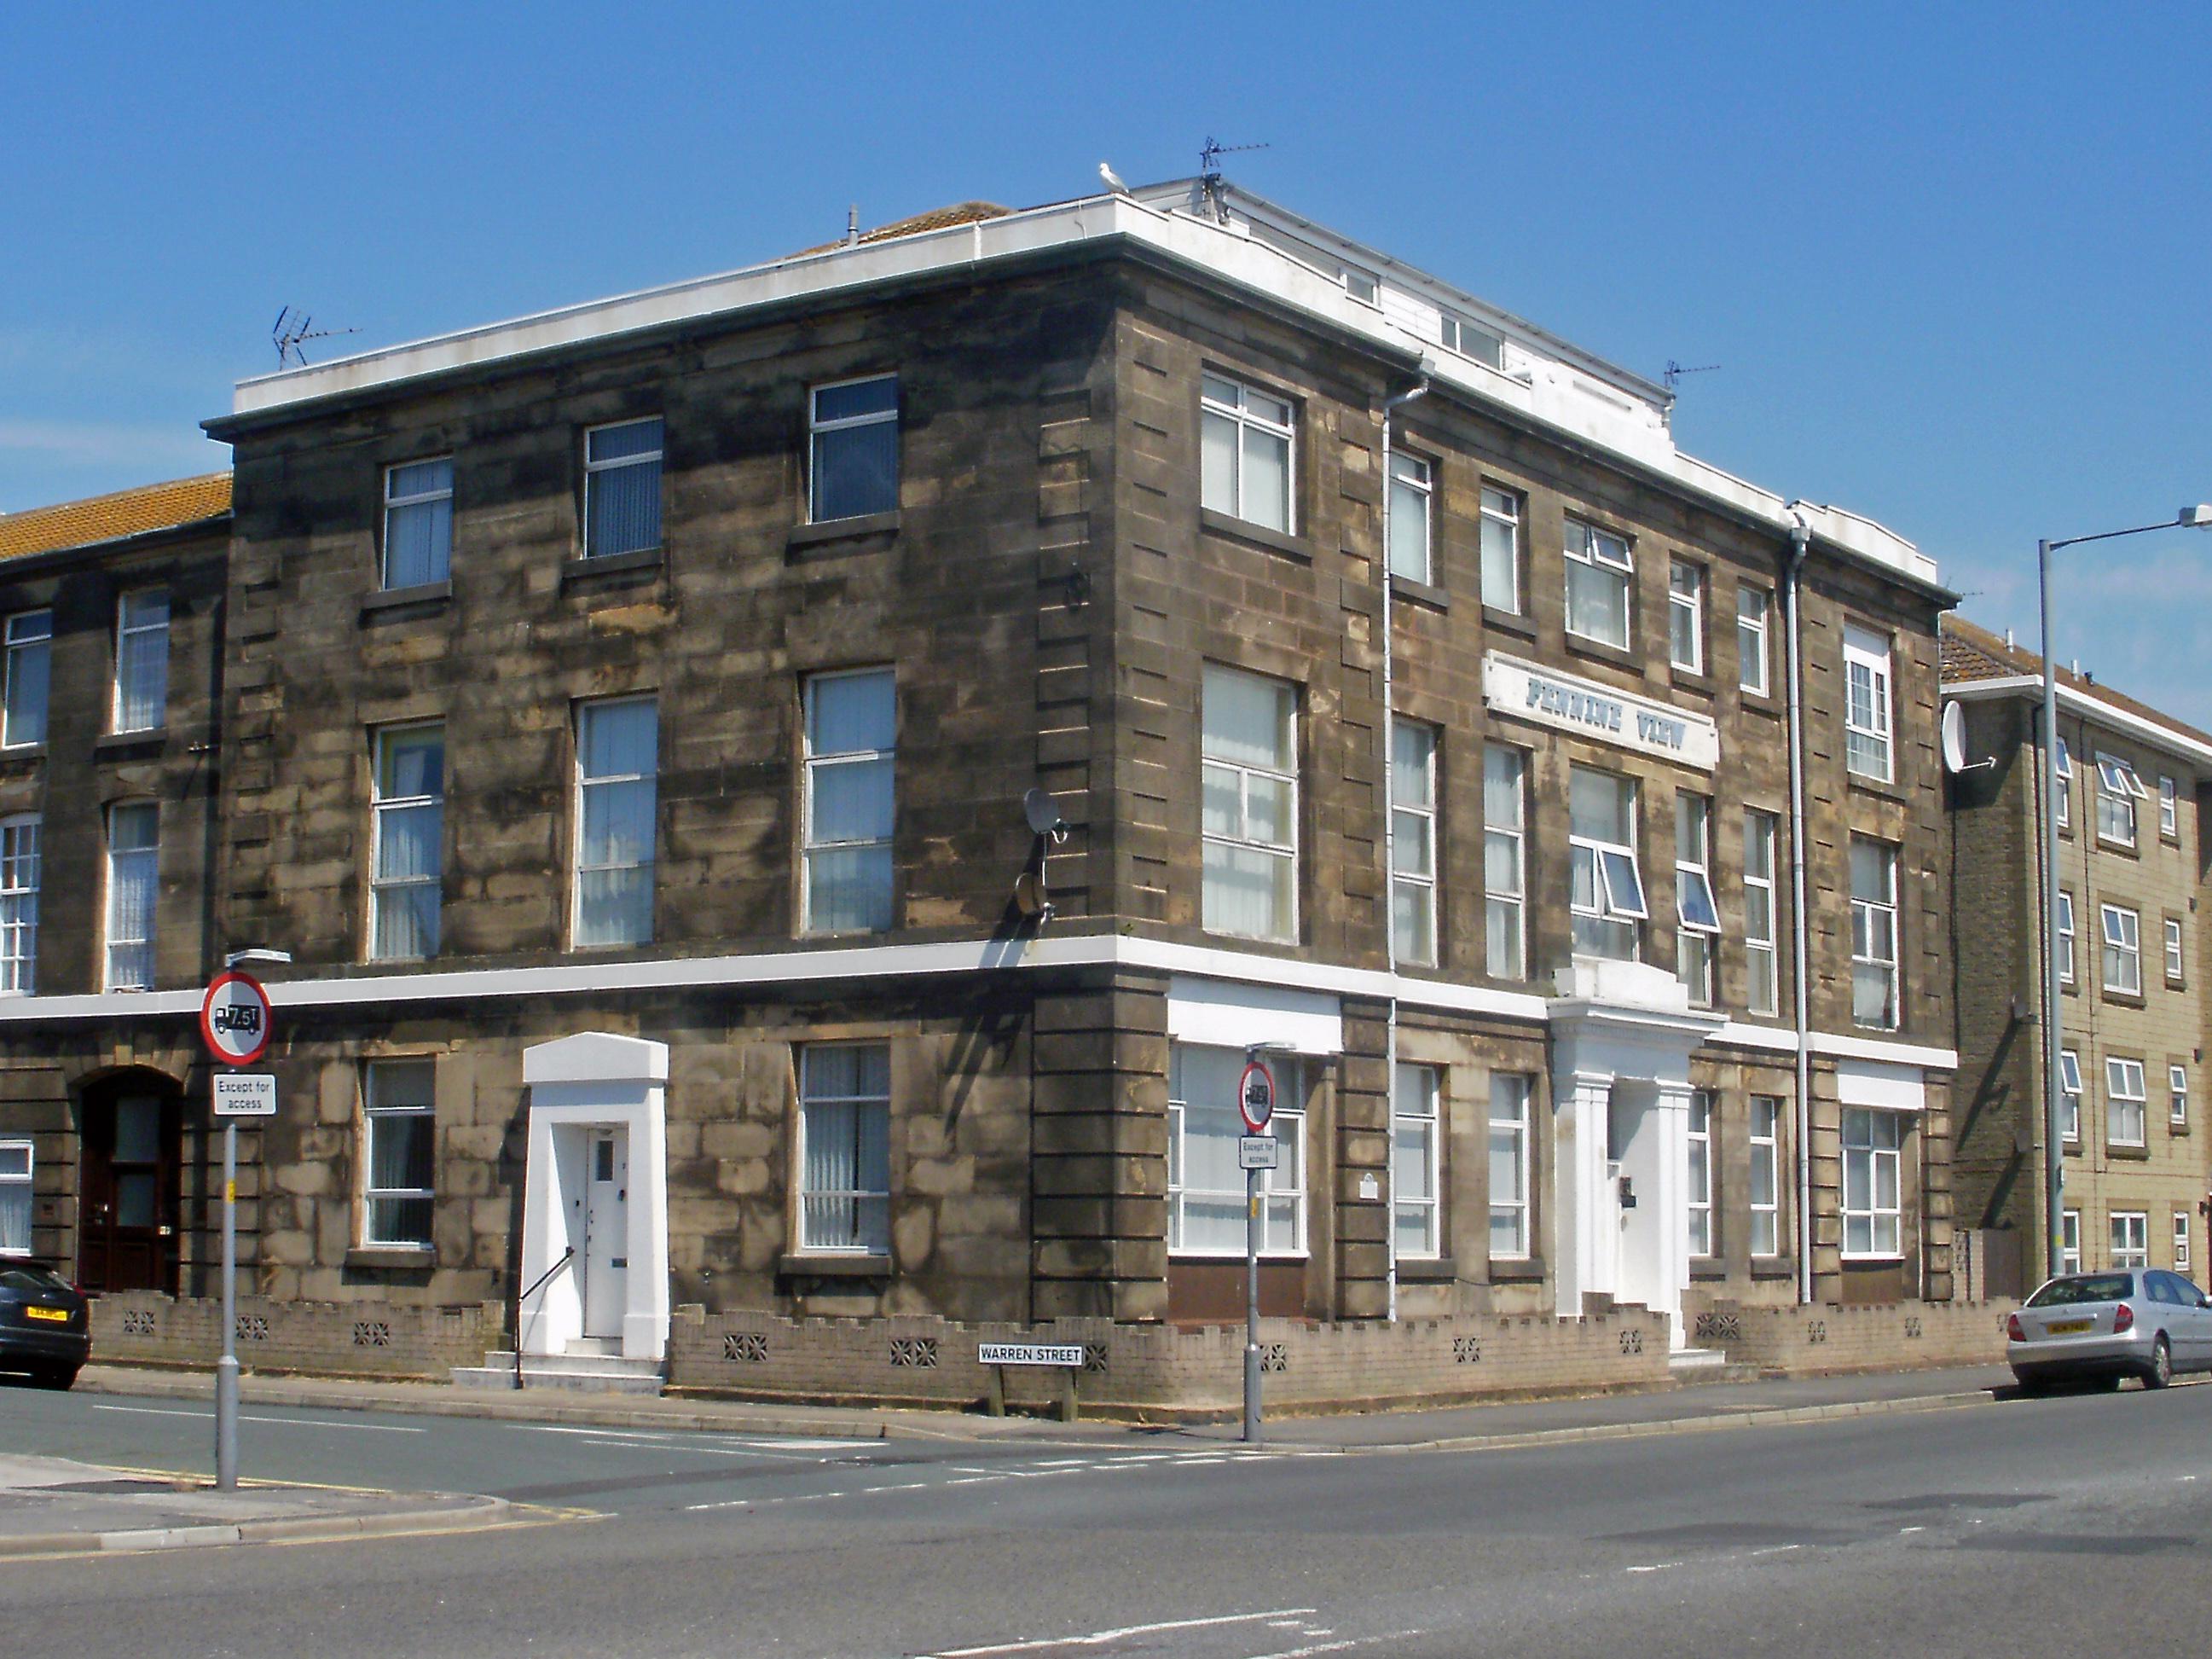 Pennine Lancashire Building Control Fees